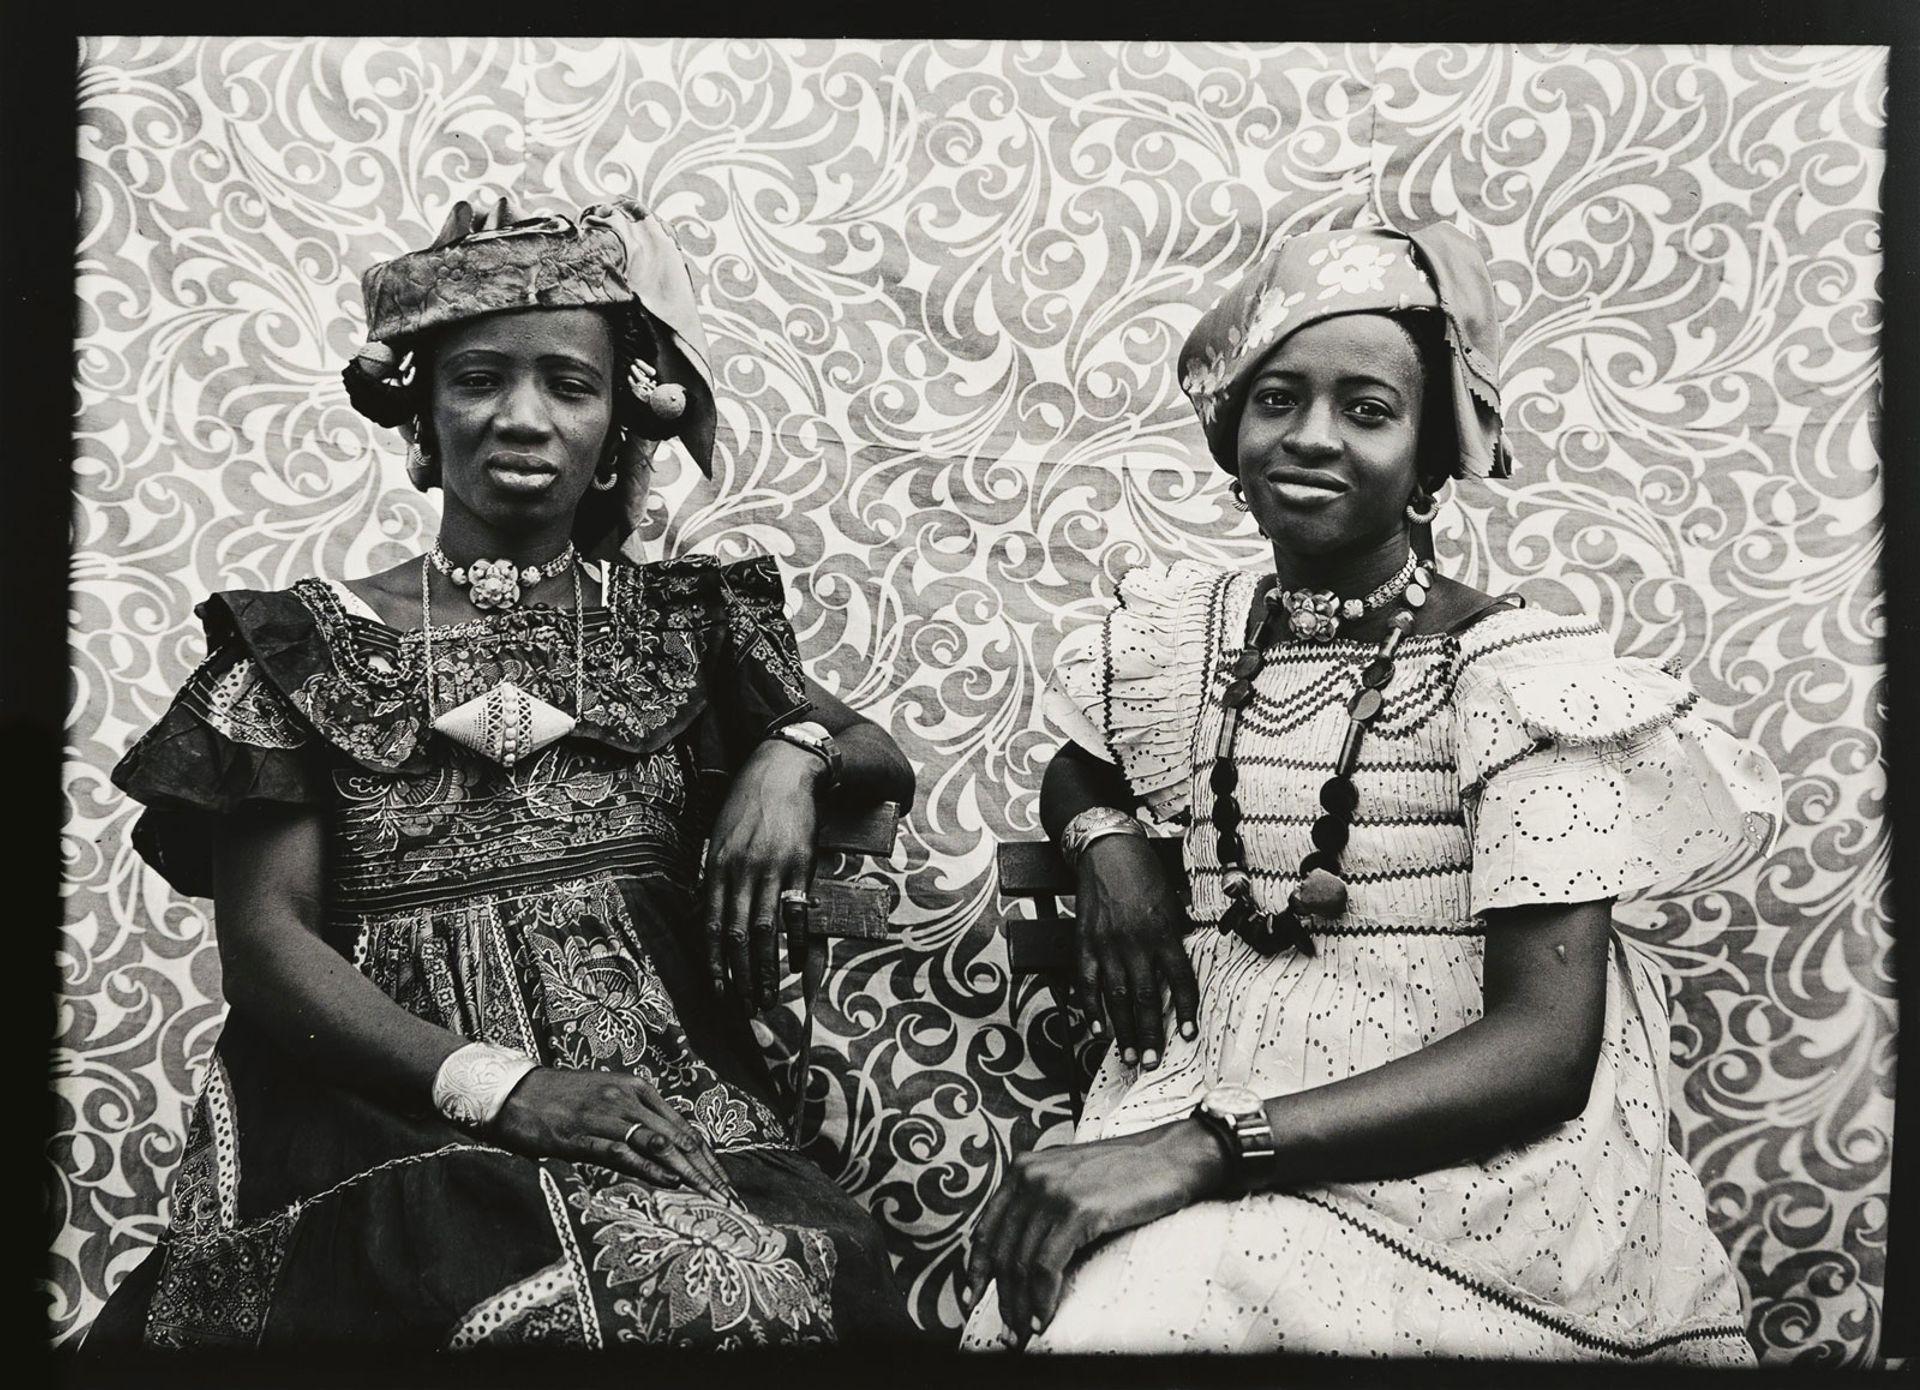 Untitled #460 (1956–57) by Seydou Keïta © Seydou Keïta/SKPE; Courtesy CAAC, The Pigozzi Collection